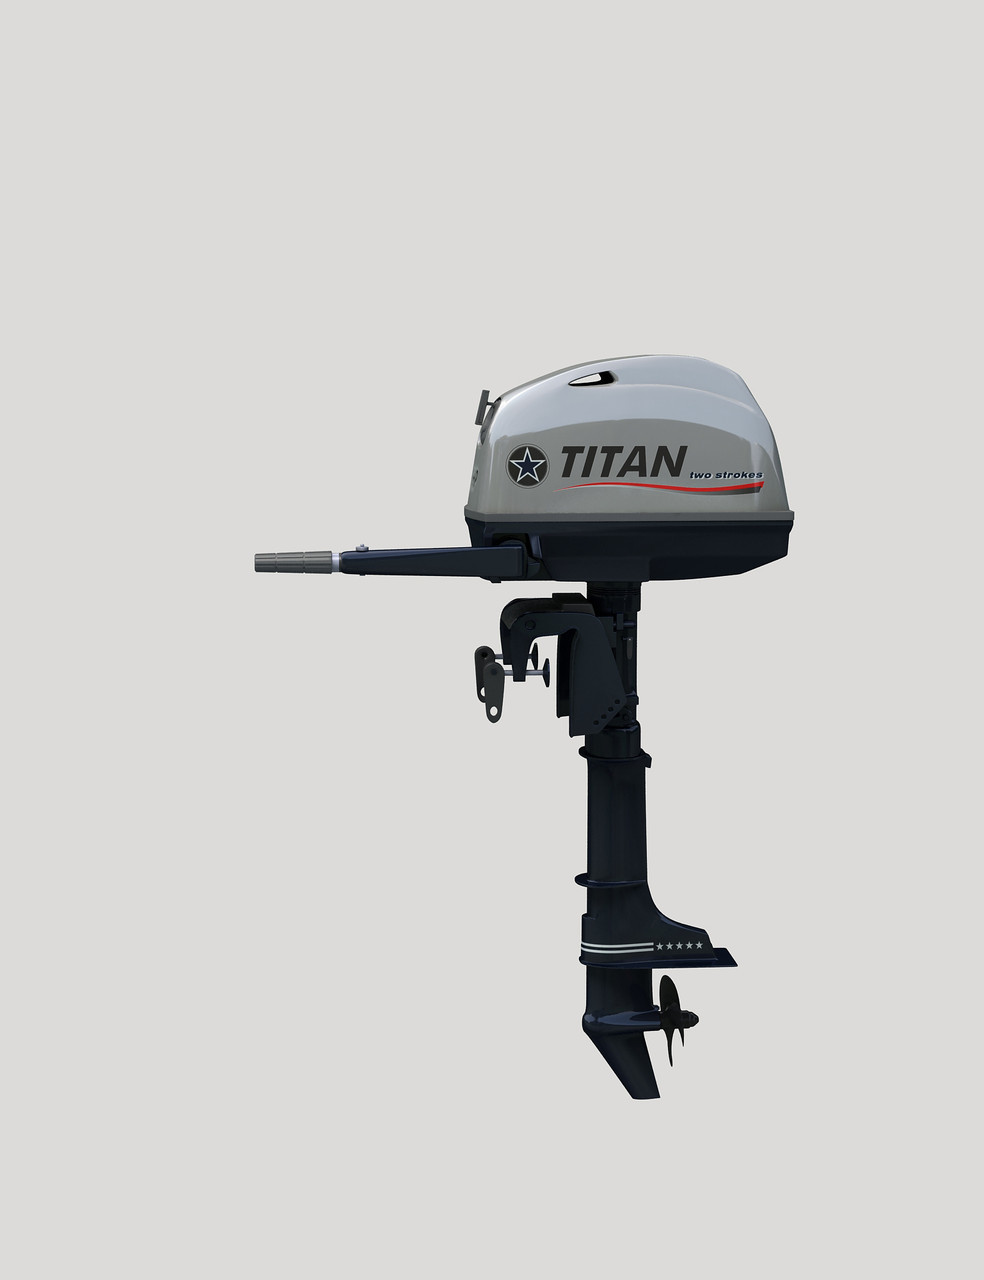 Titan TP 6 AMHS